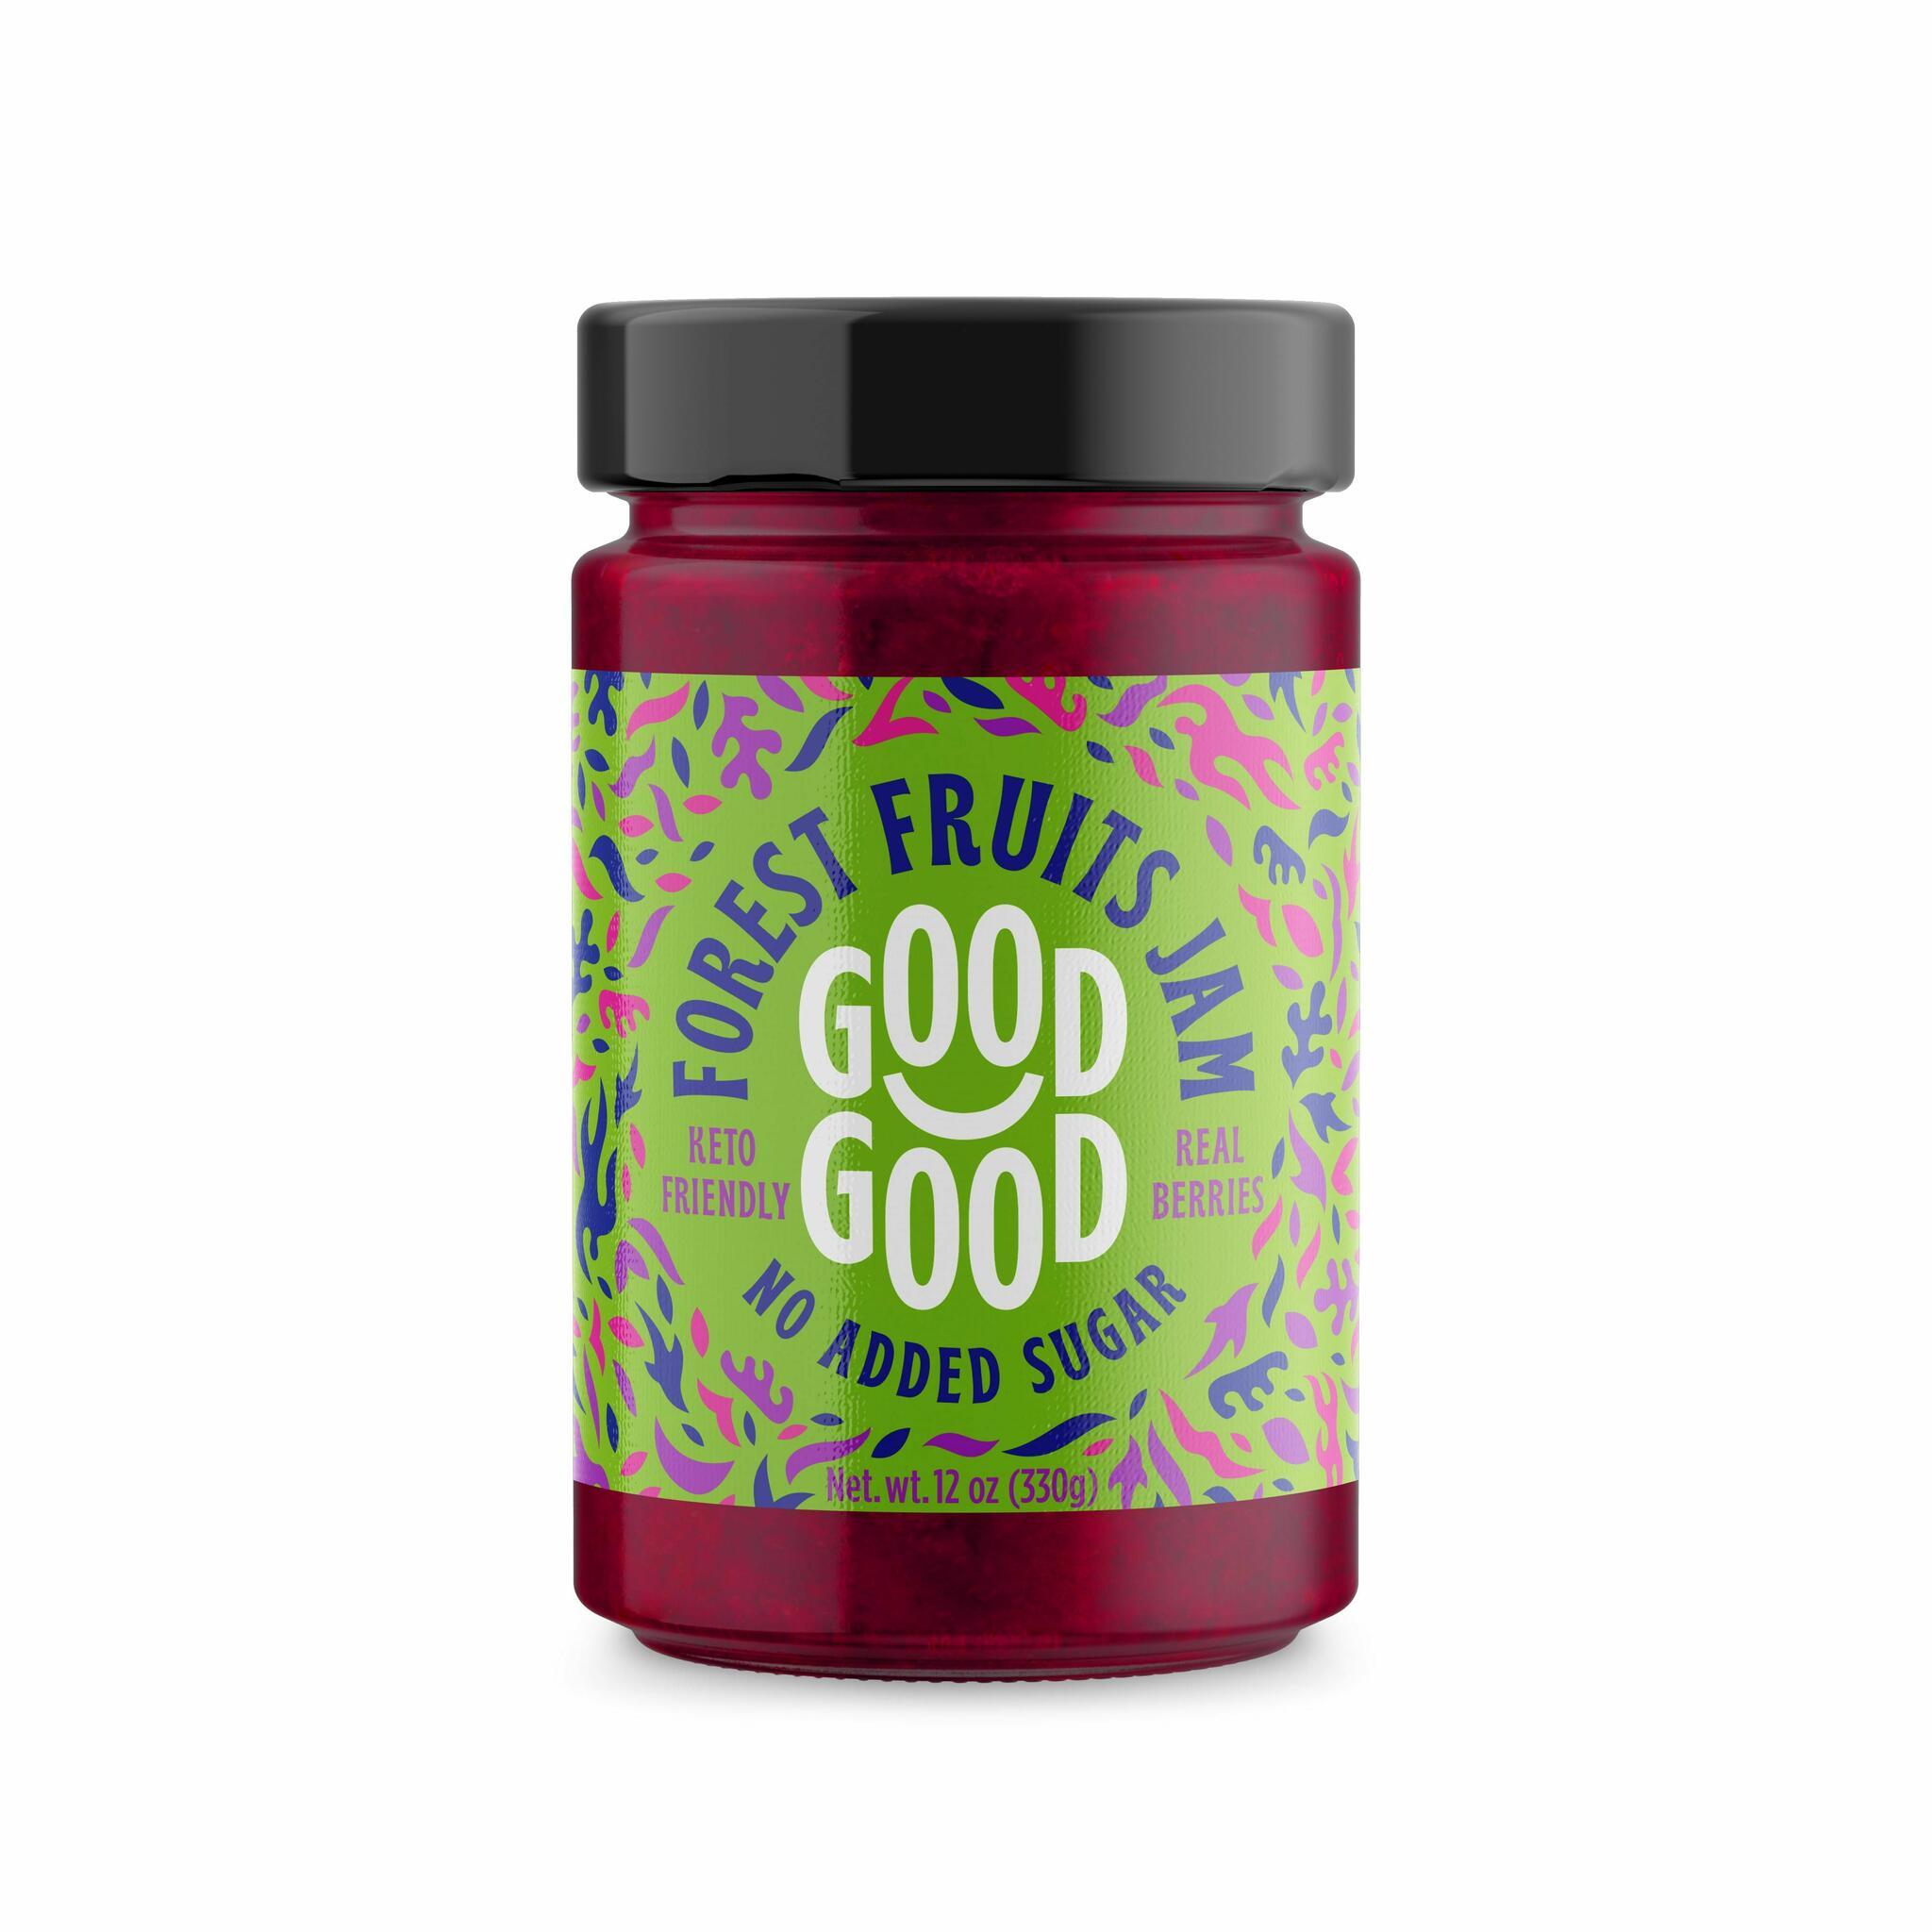 Good Good metsamarjamoos steviaga 330g (6)